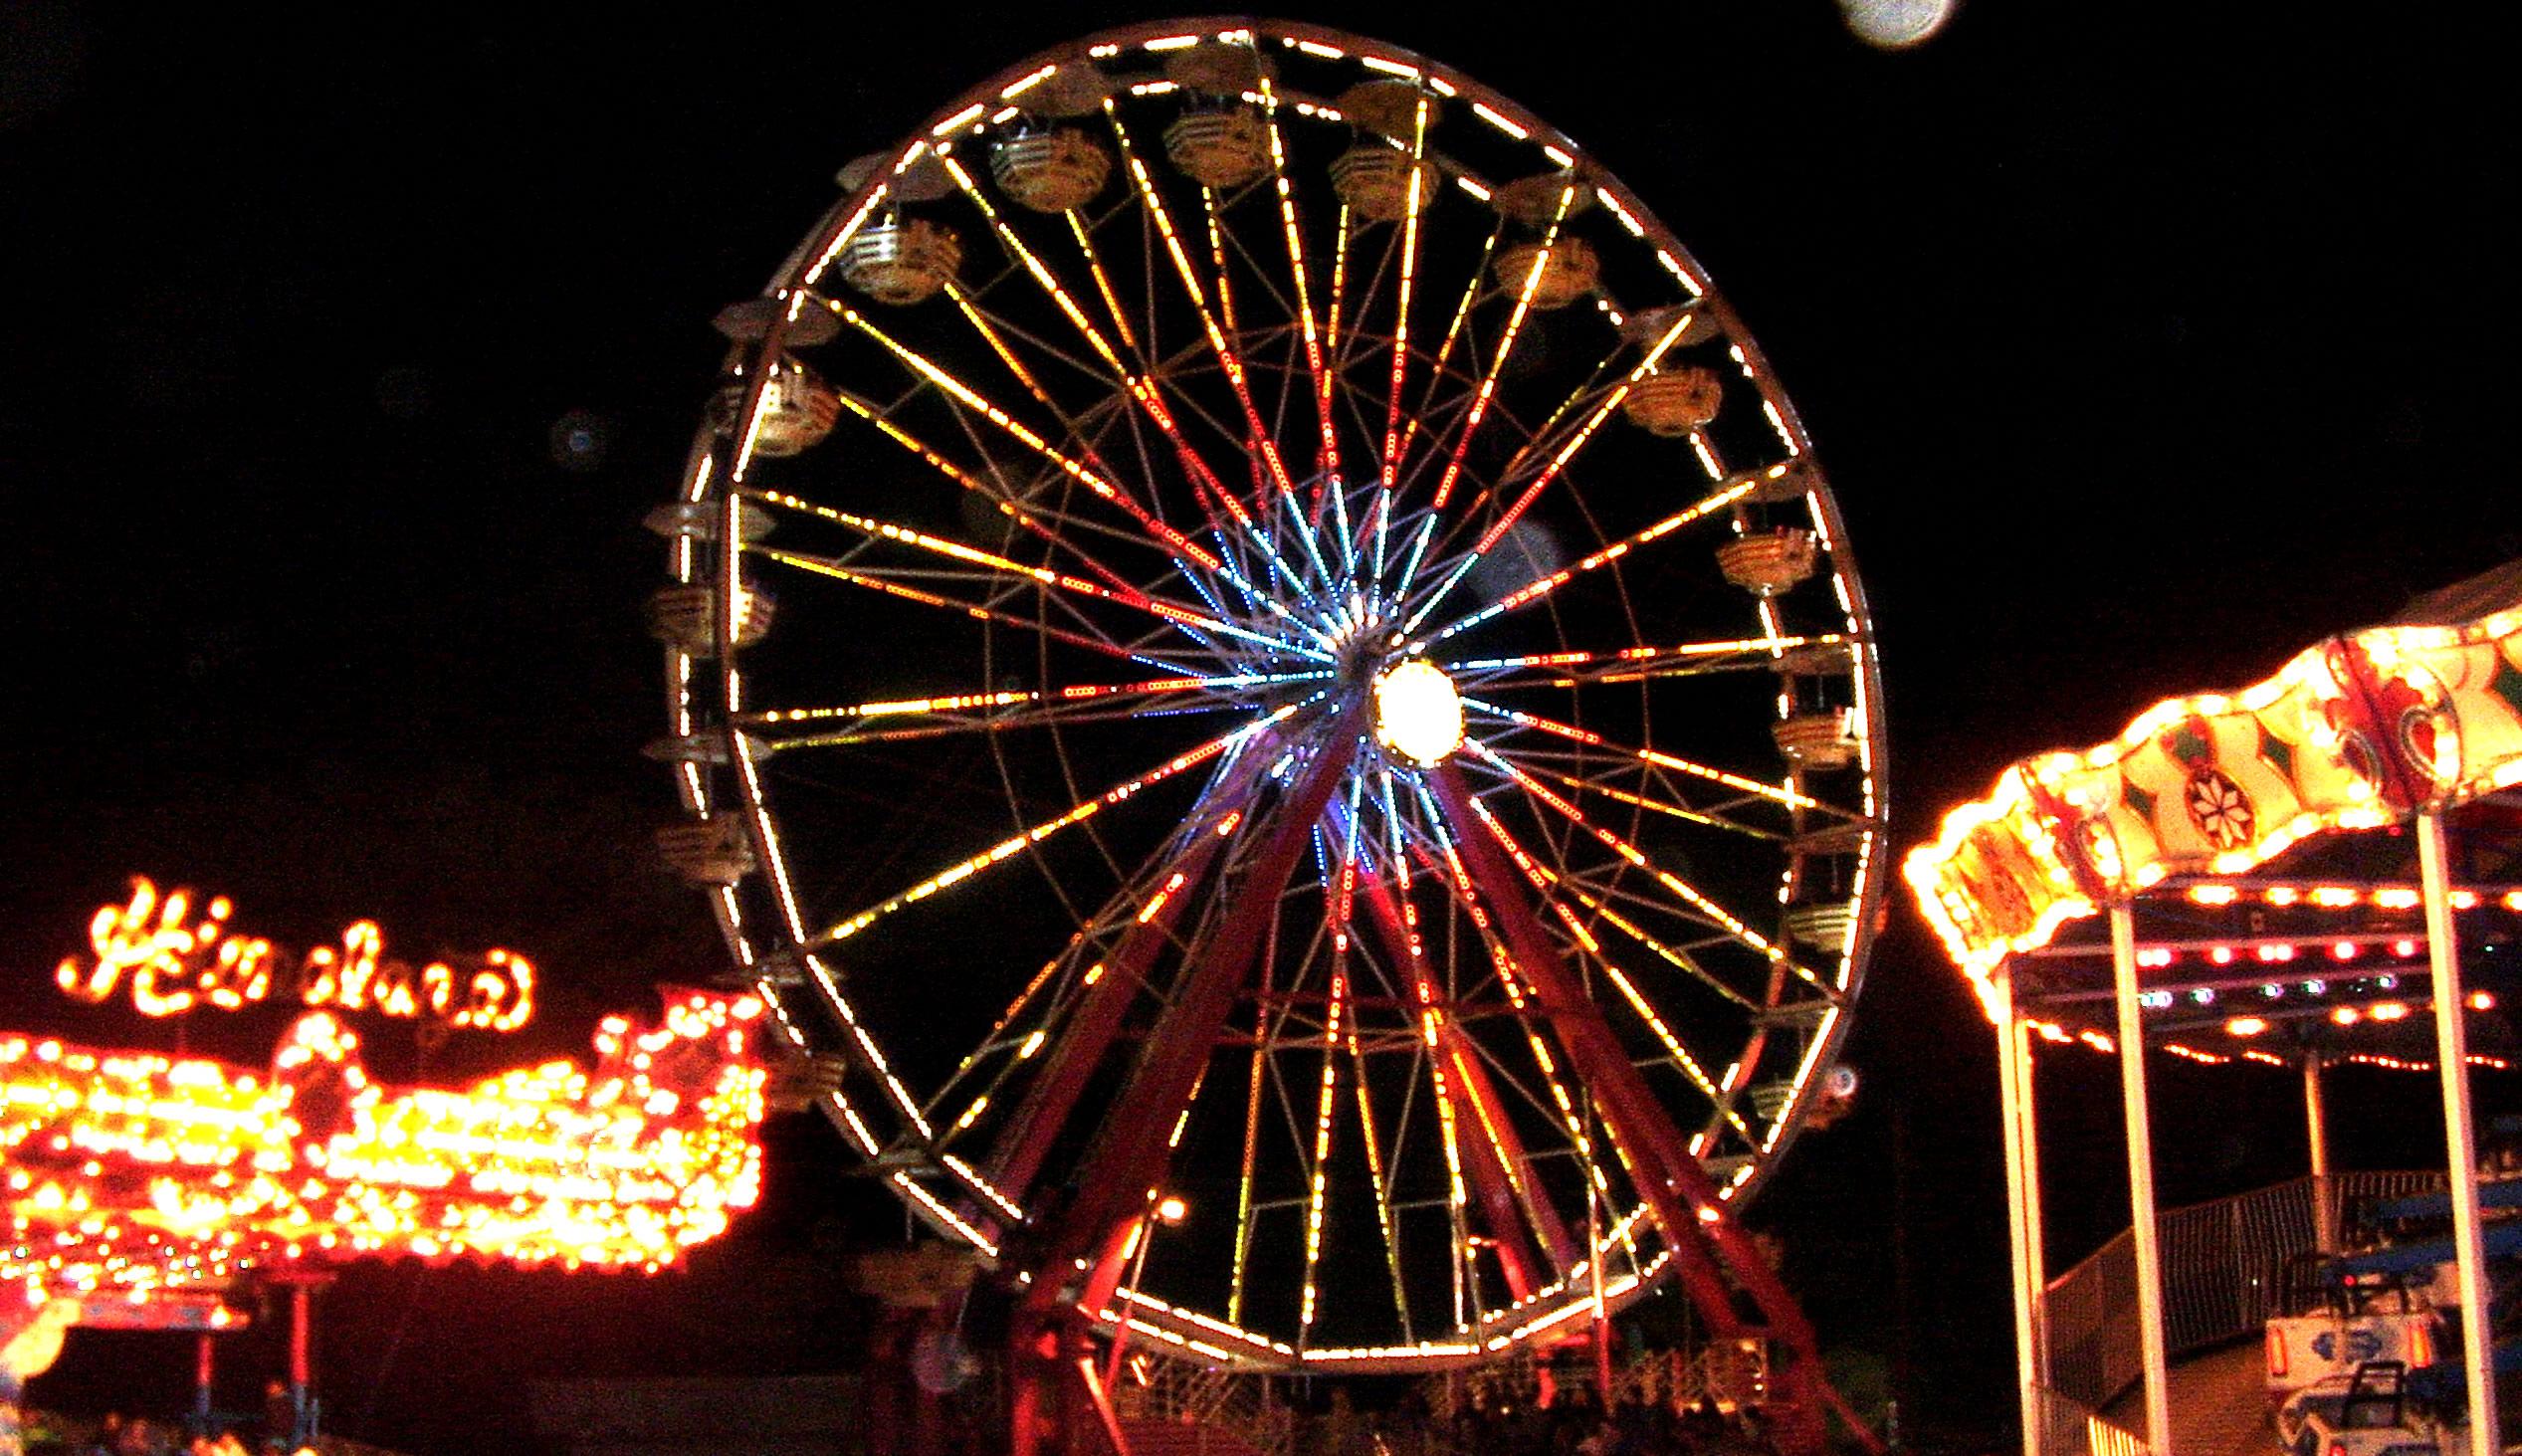 coosa-valley-fair